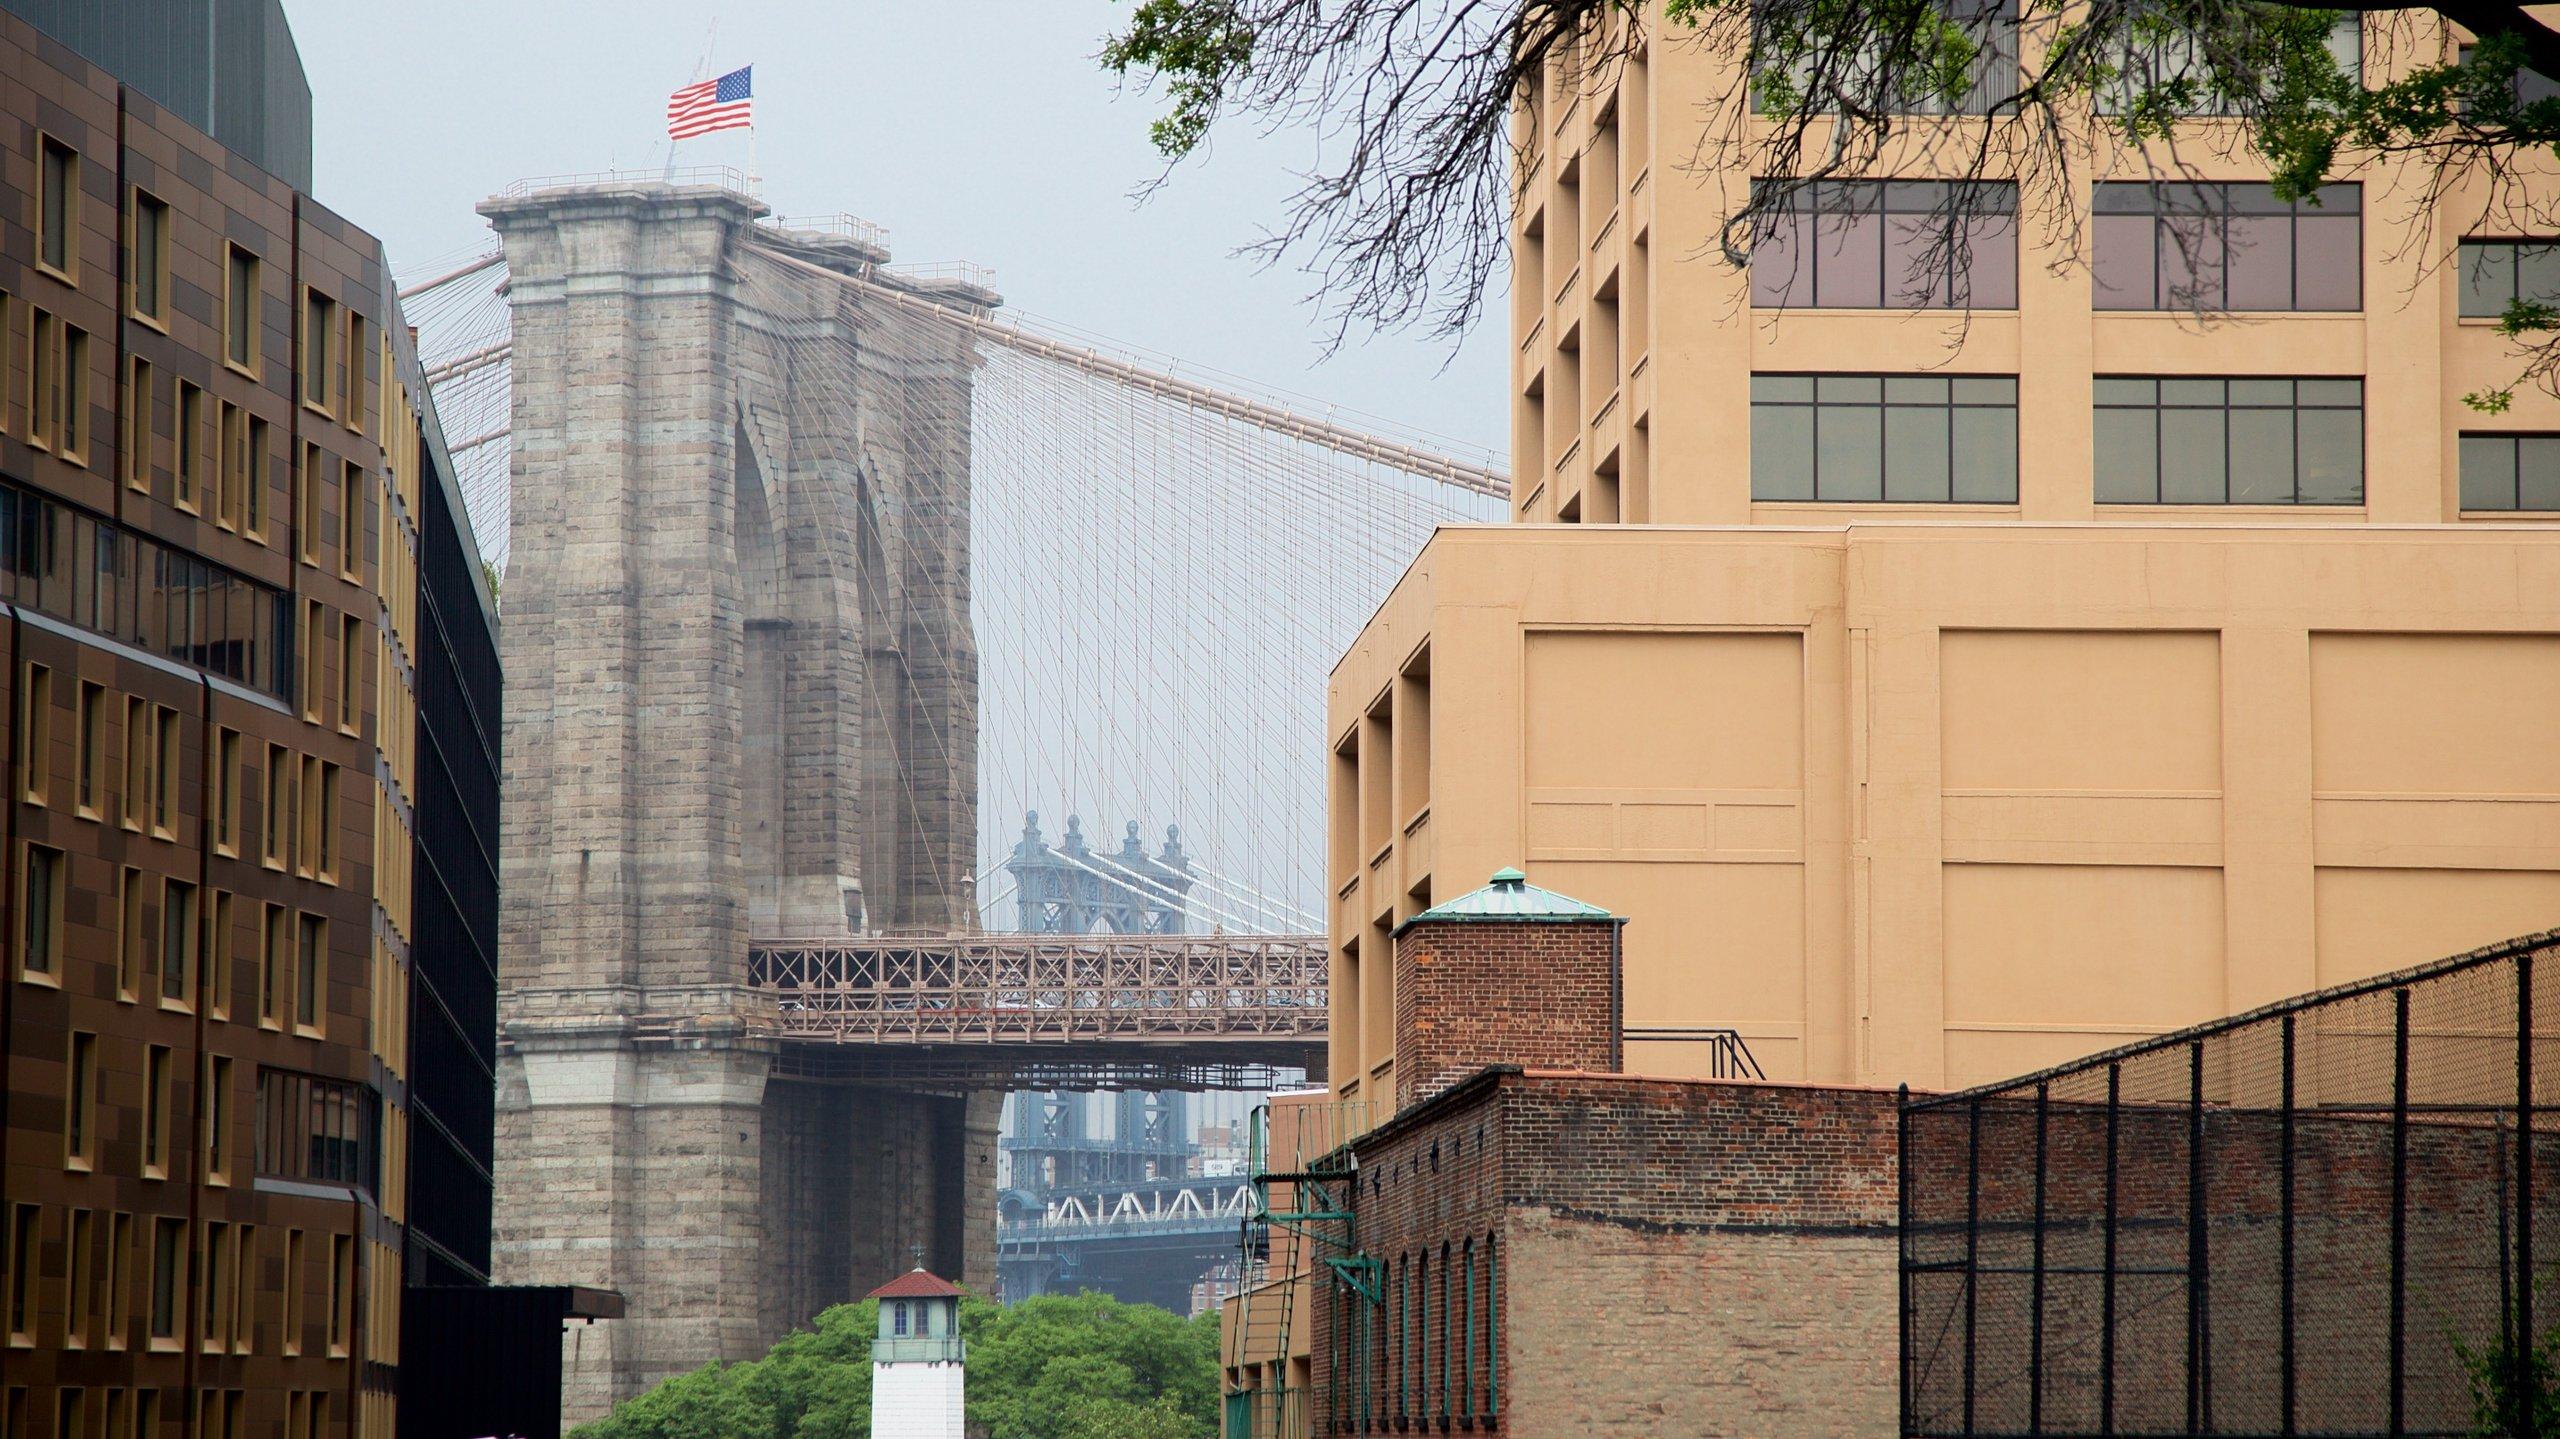 Downtown Brooklyn caratteristiche di ponte e città